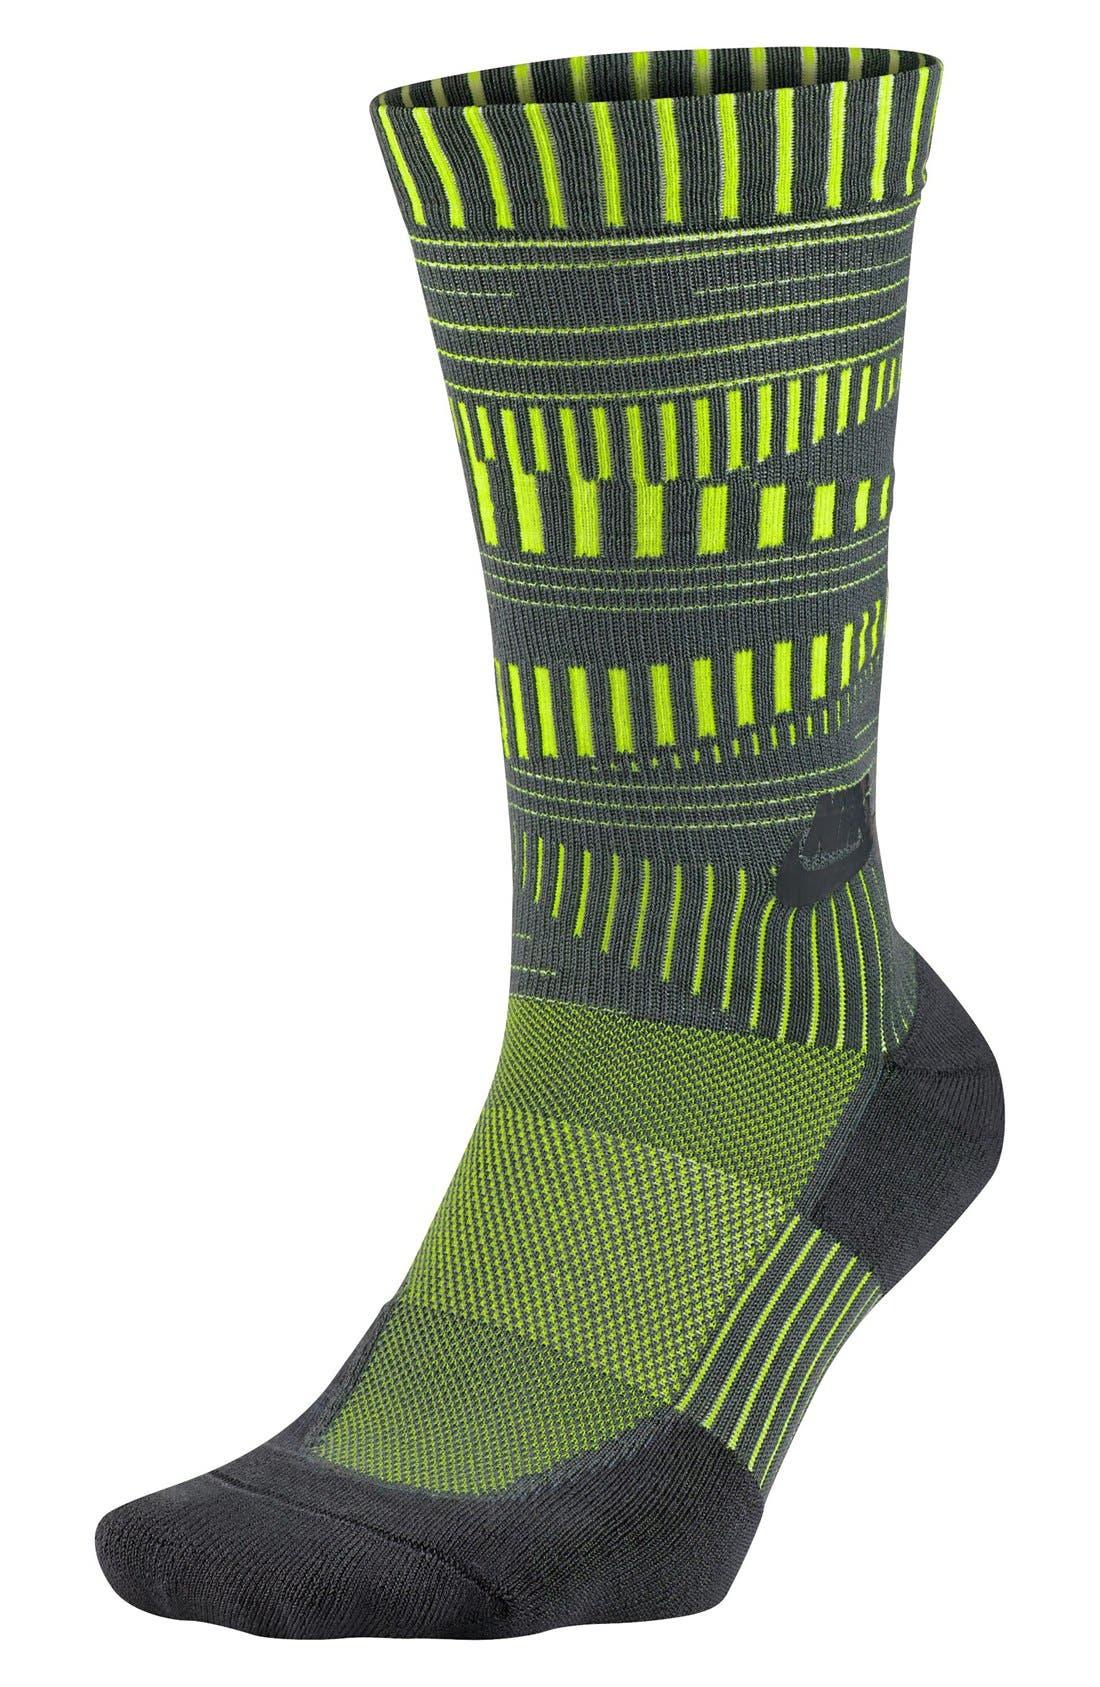 Crew Socks,                             Main thumbnail 1, color,                             021